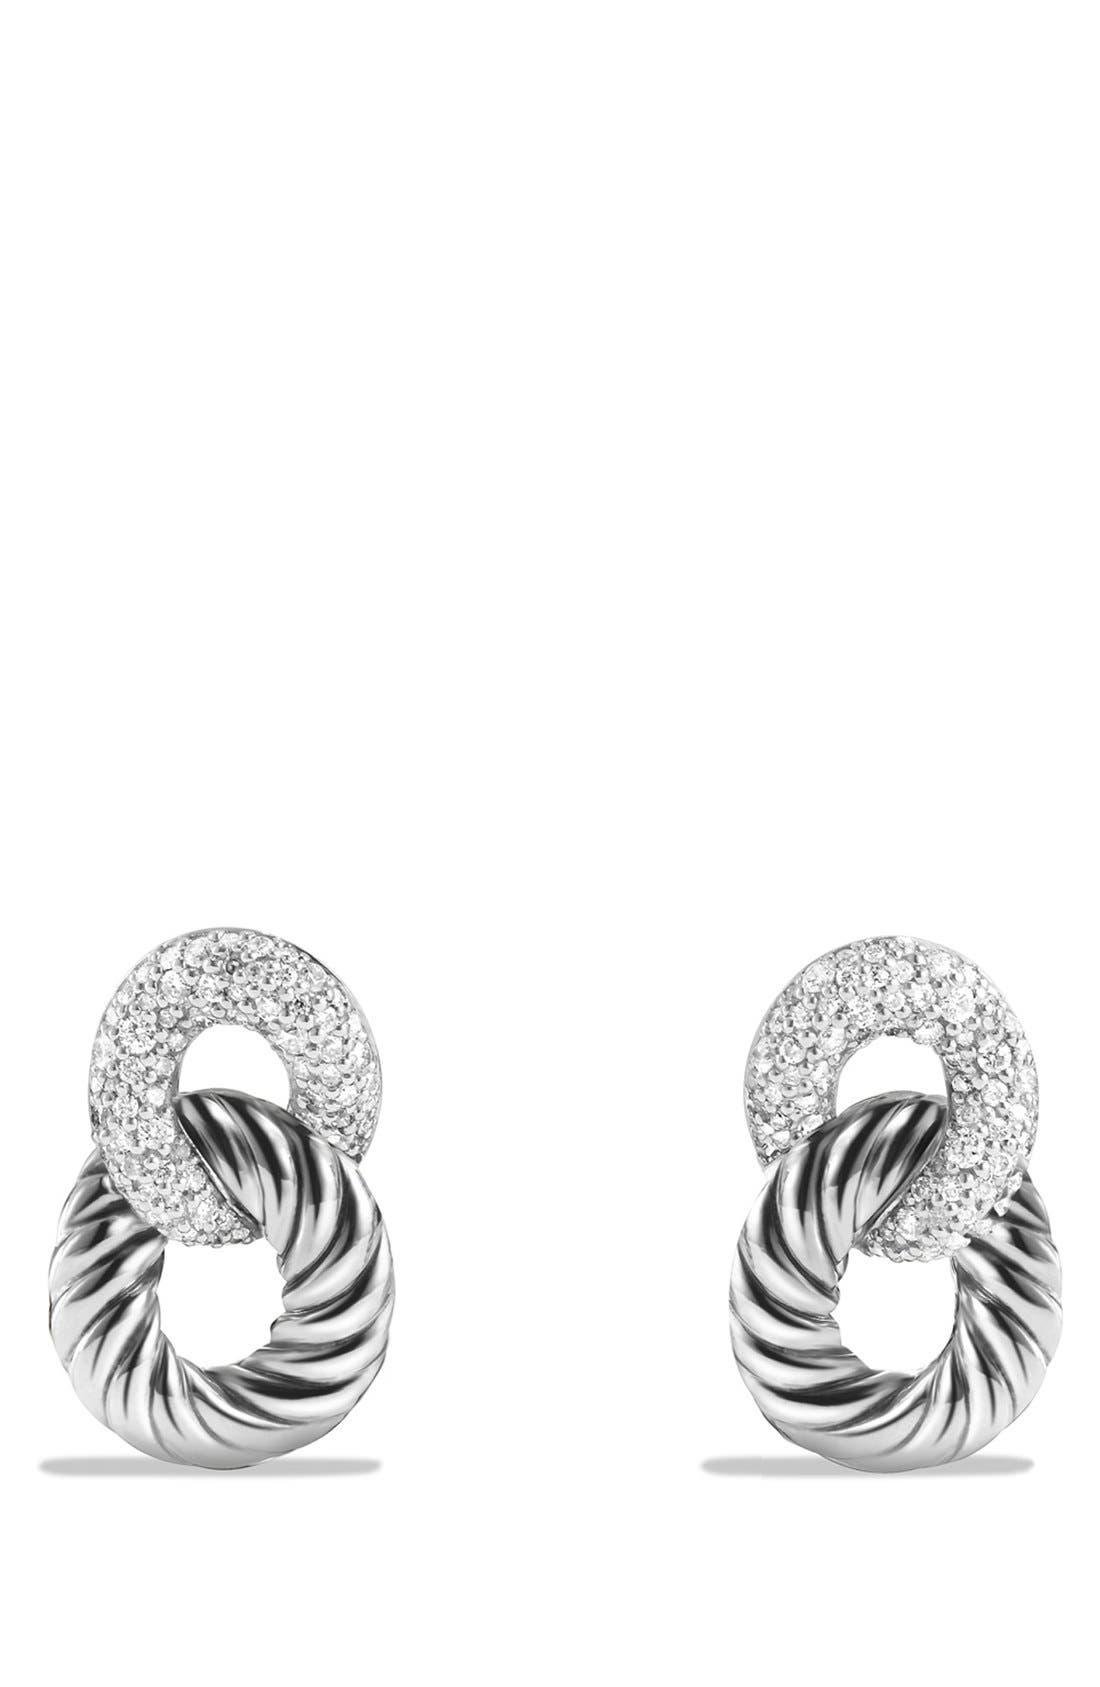 'Belmont Curb Link' Drop Earrings with Diamonds,                         Main,                         color, Diamond